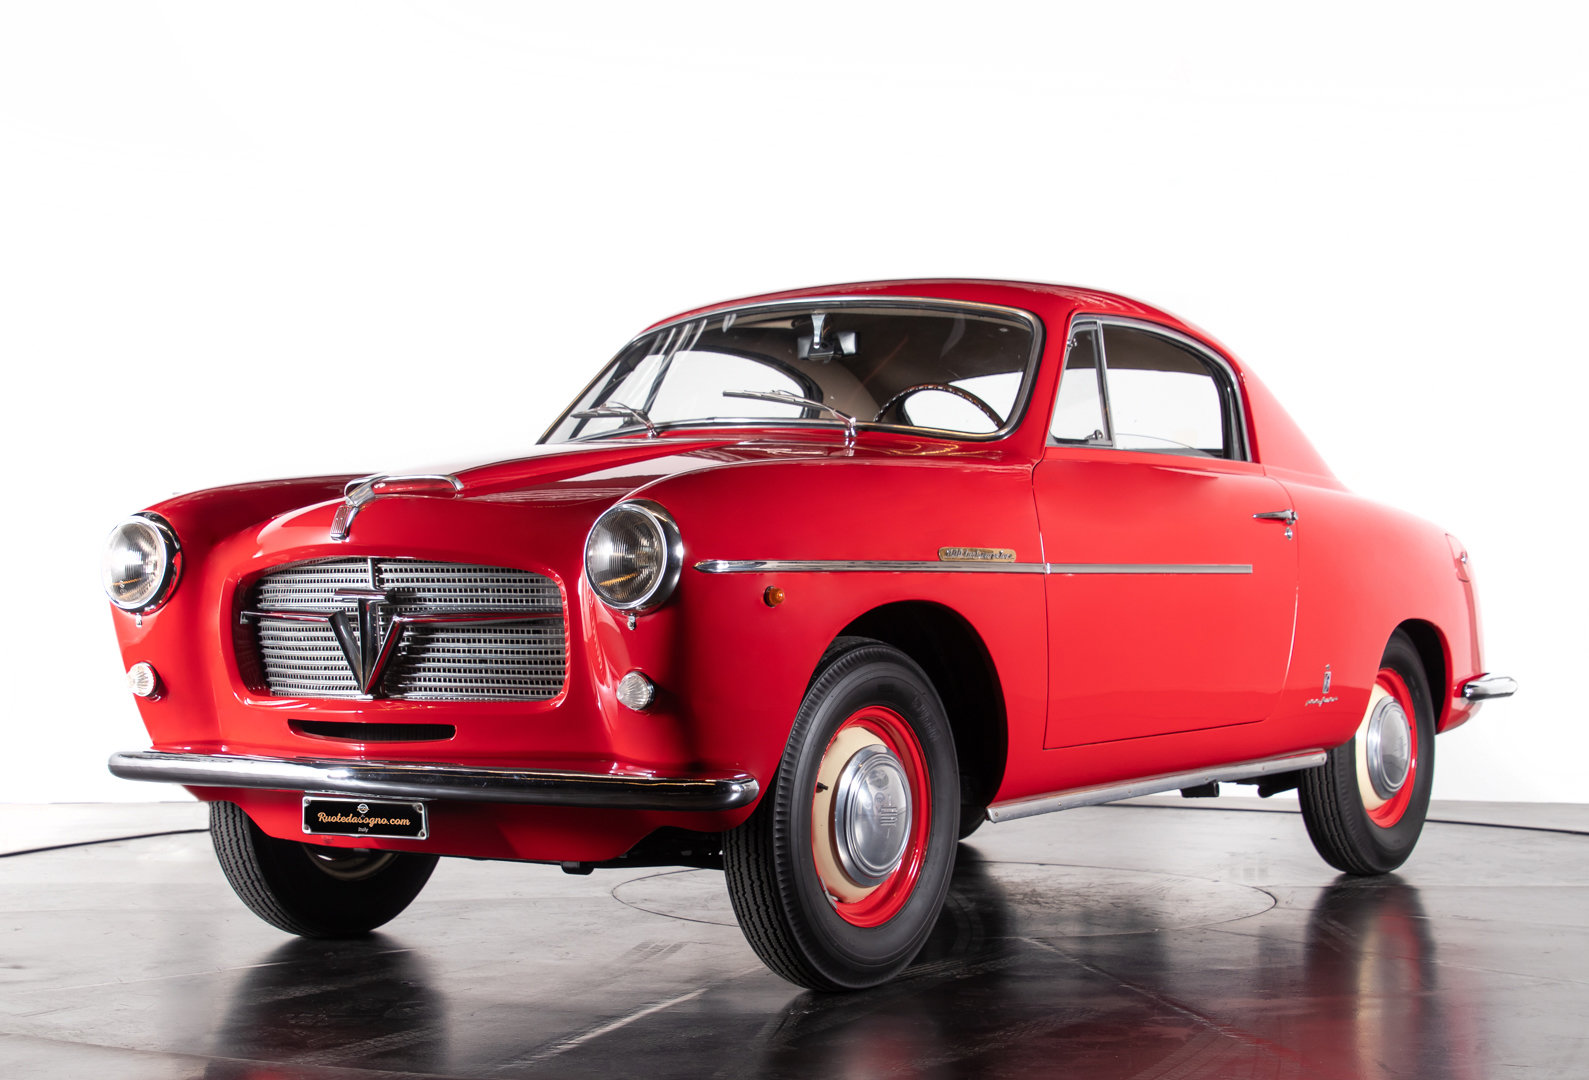 FIAT 1100/103 TV COUPè PININFARINA - 1954 For Sale (picture 3 of 6)